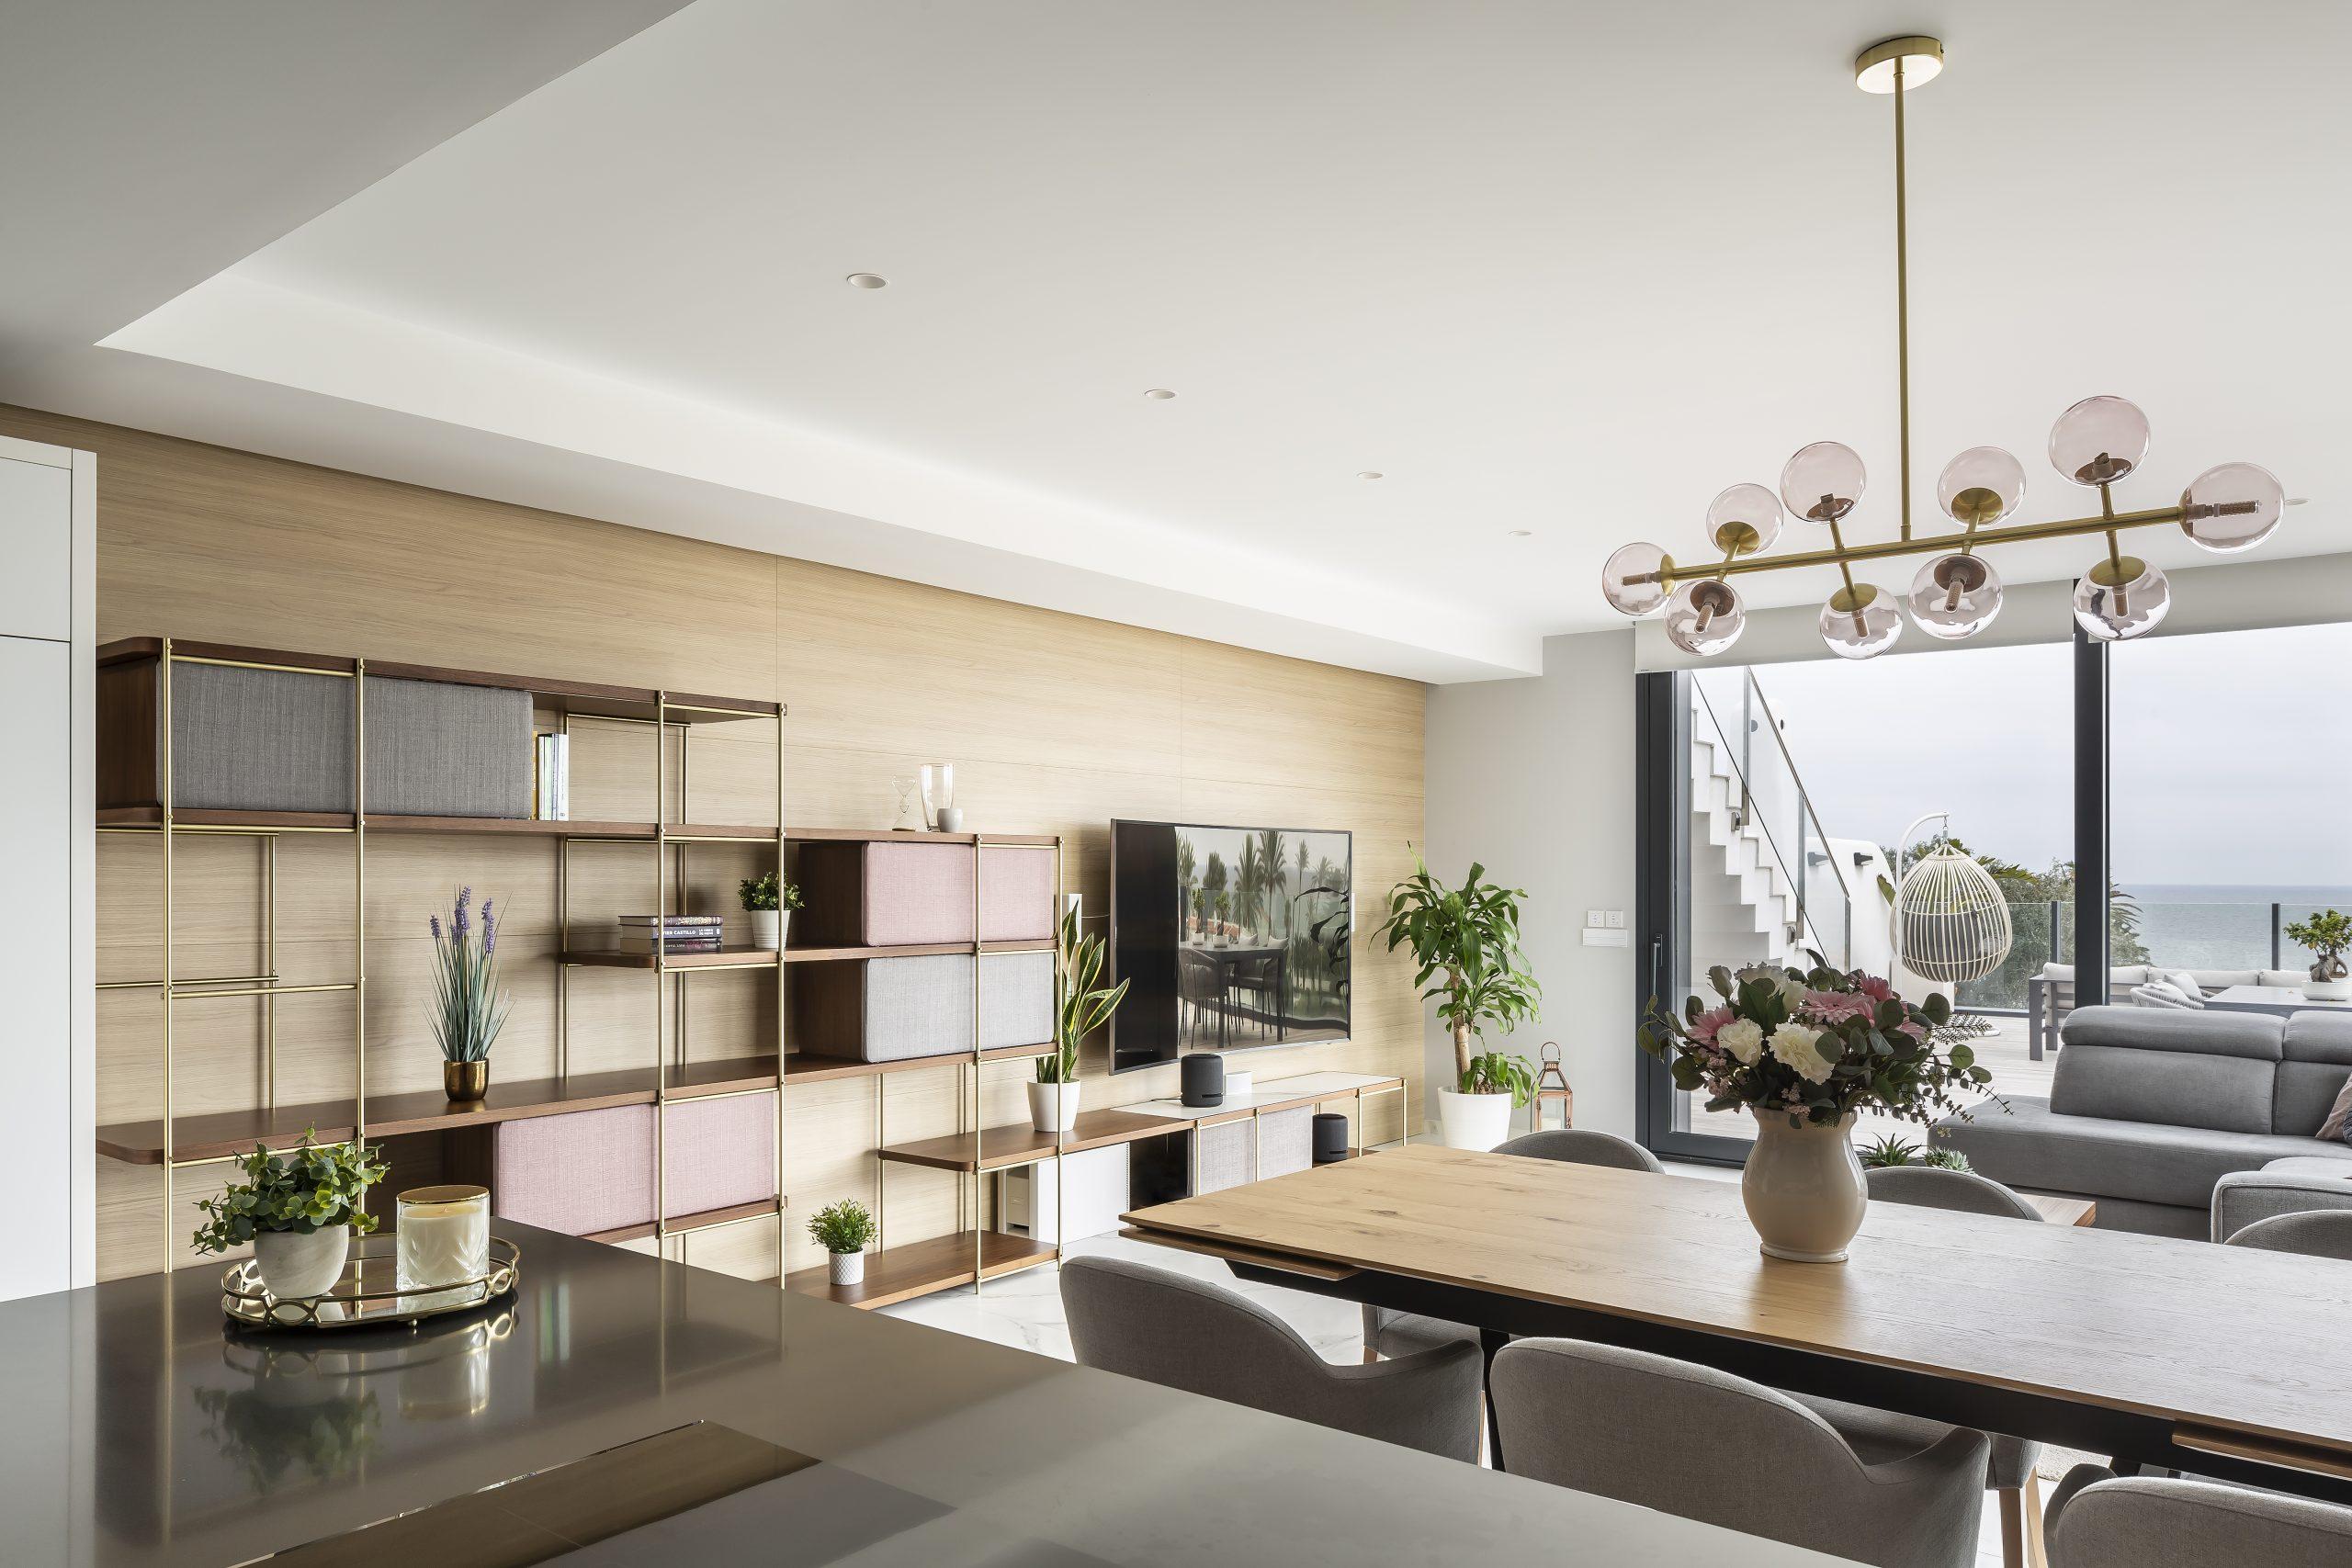 Cosy interior design Momocca furniture